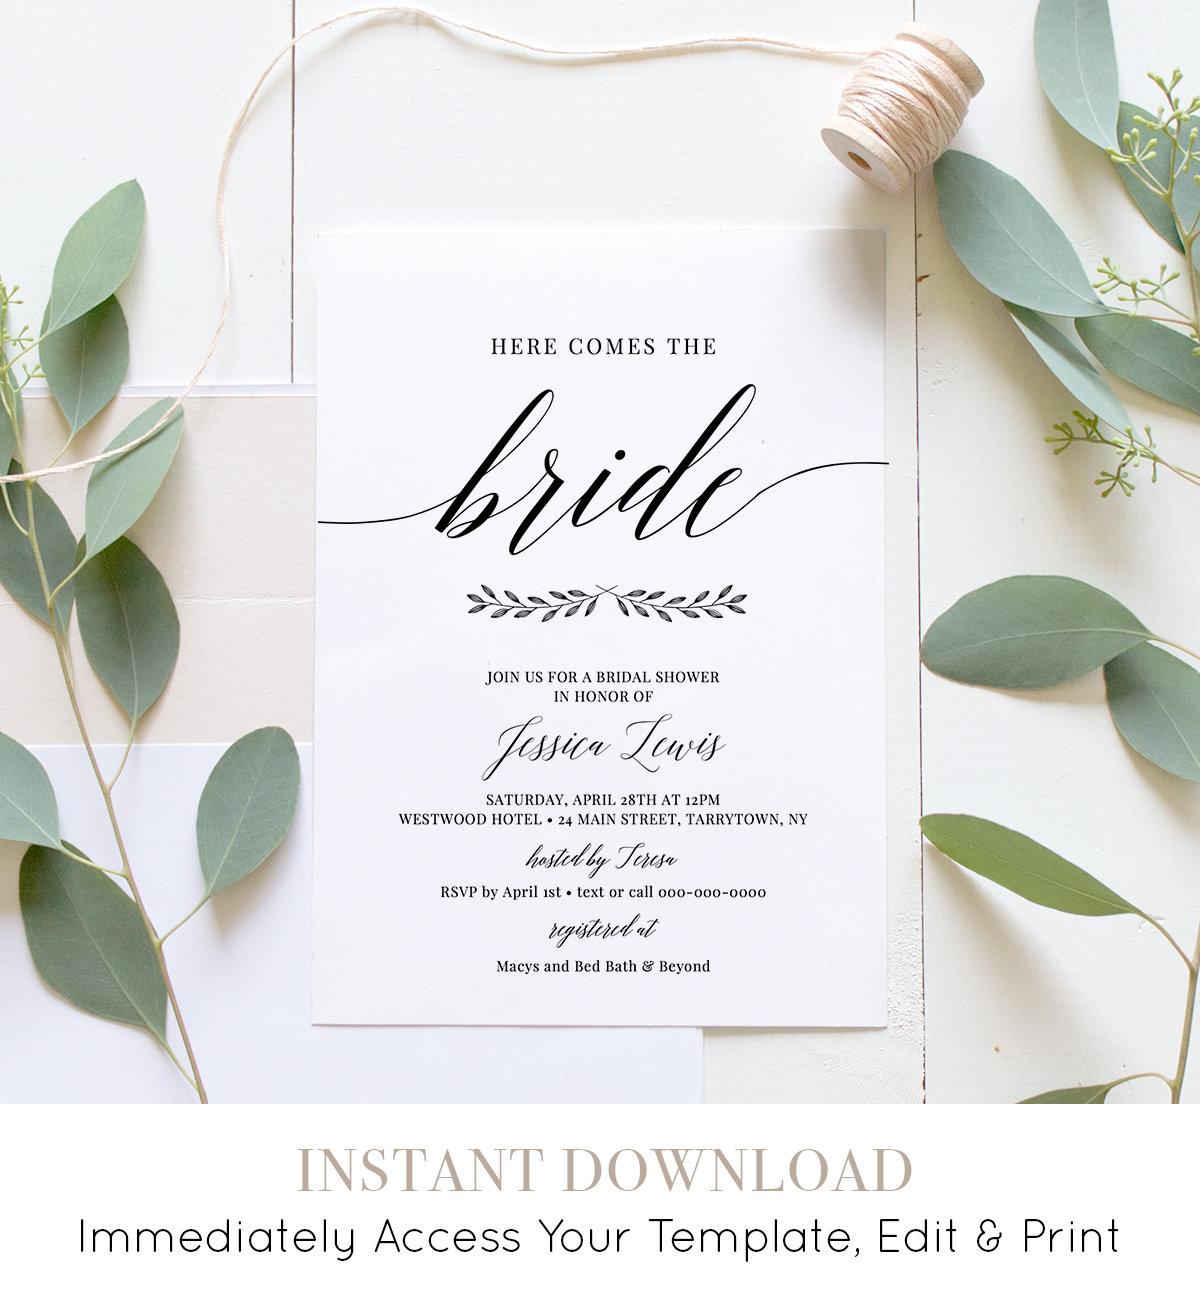 bridal shower invitation printable wedding shower invite template instant download 100 editable simple modern diy templett 034 121bs